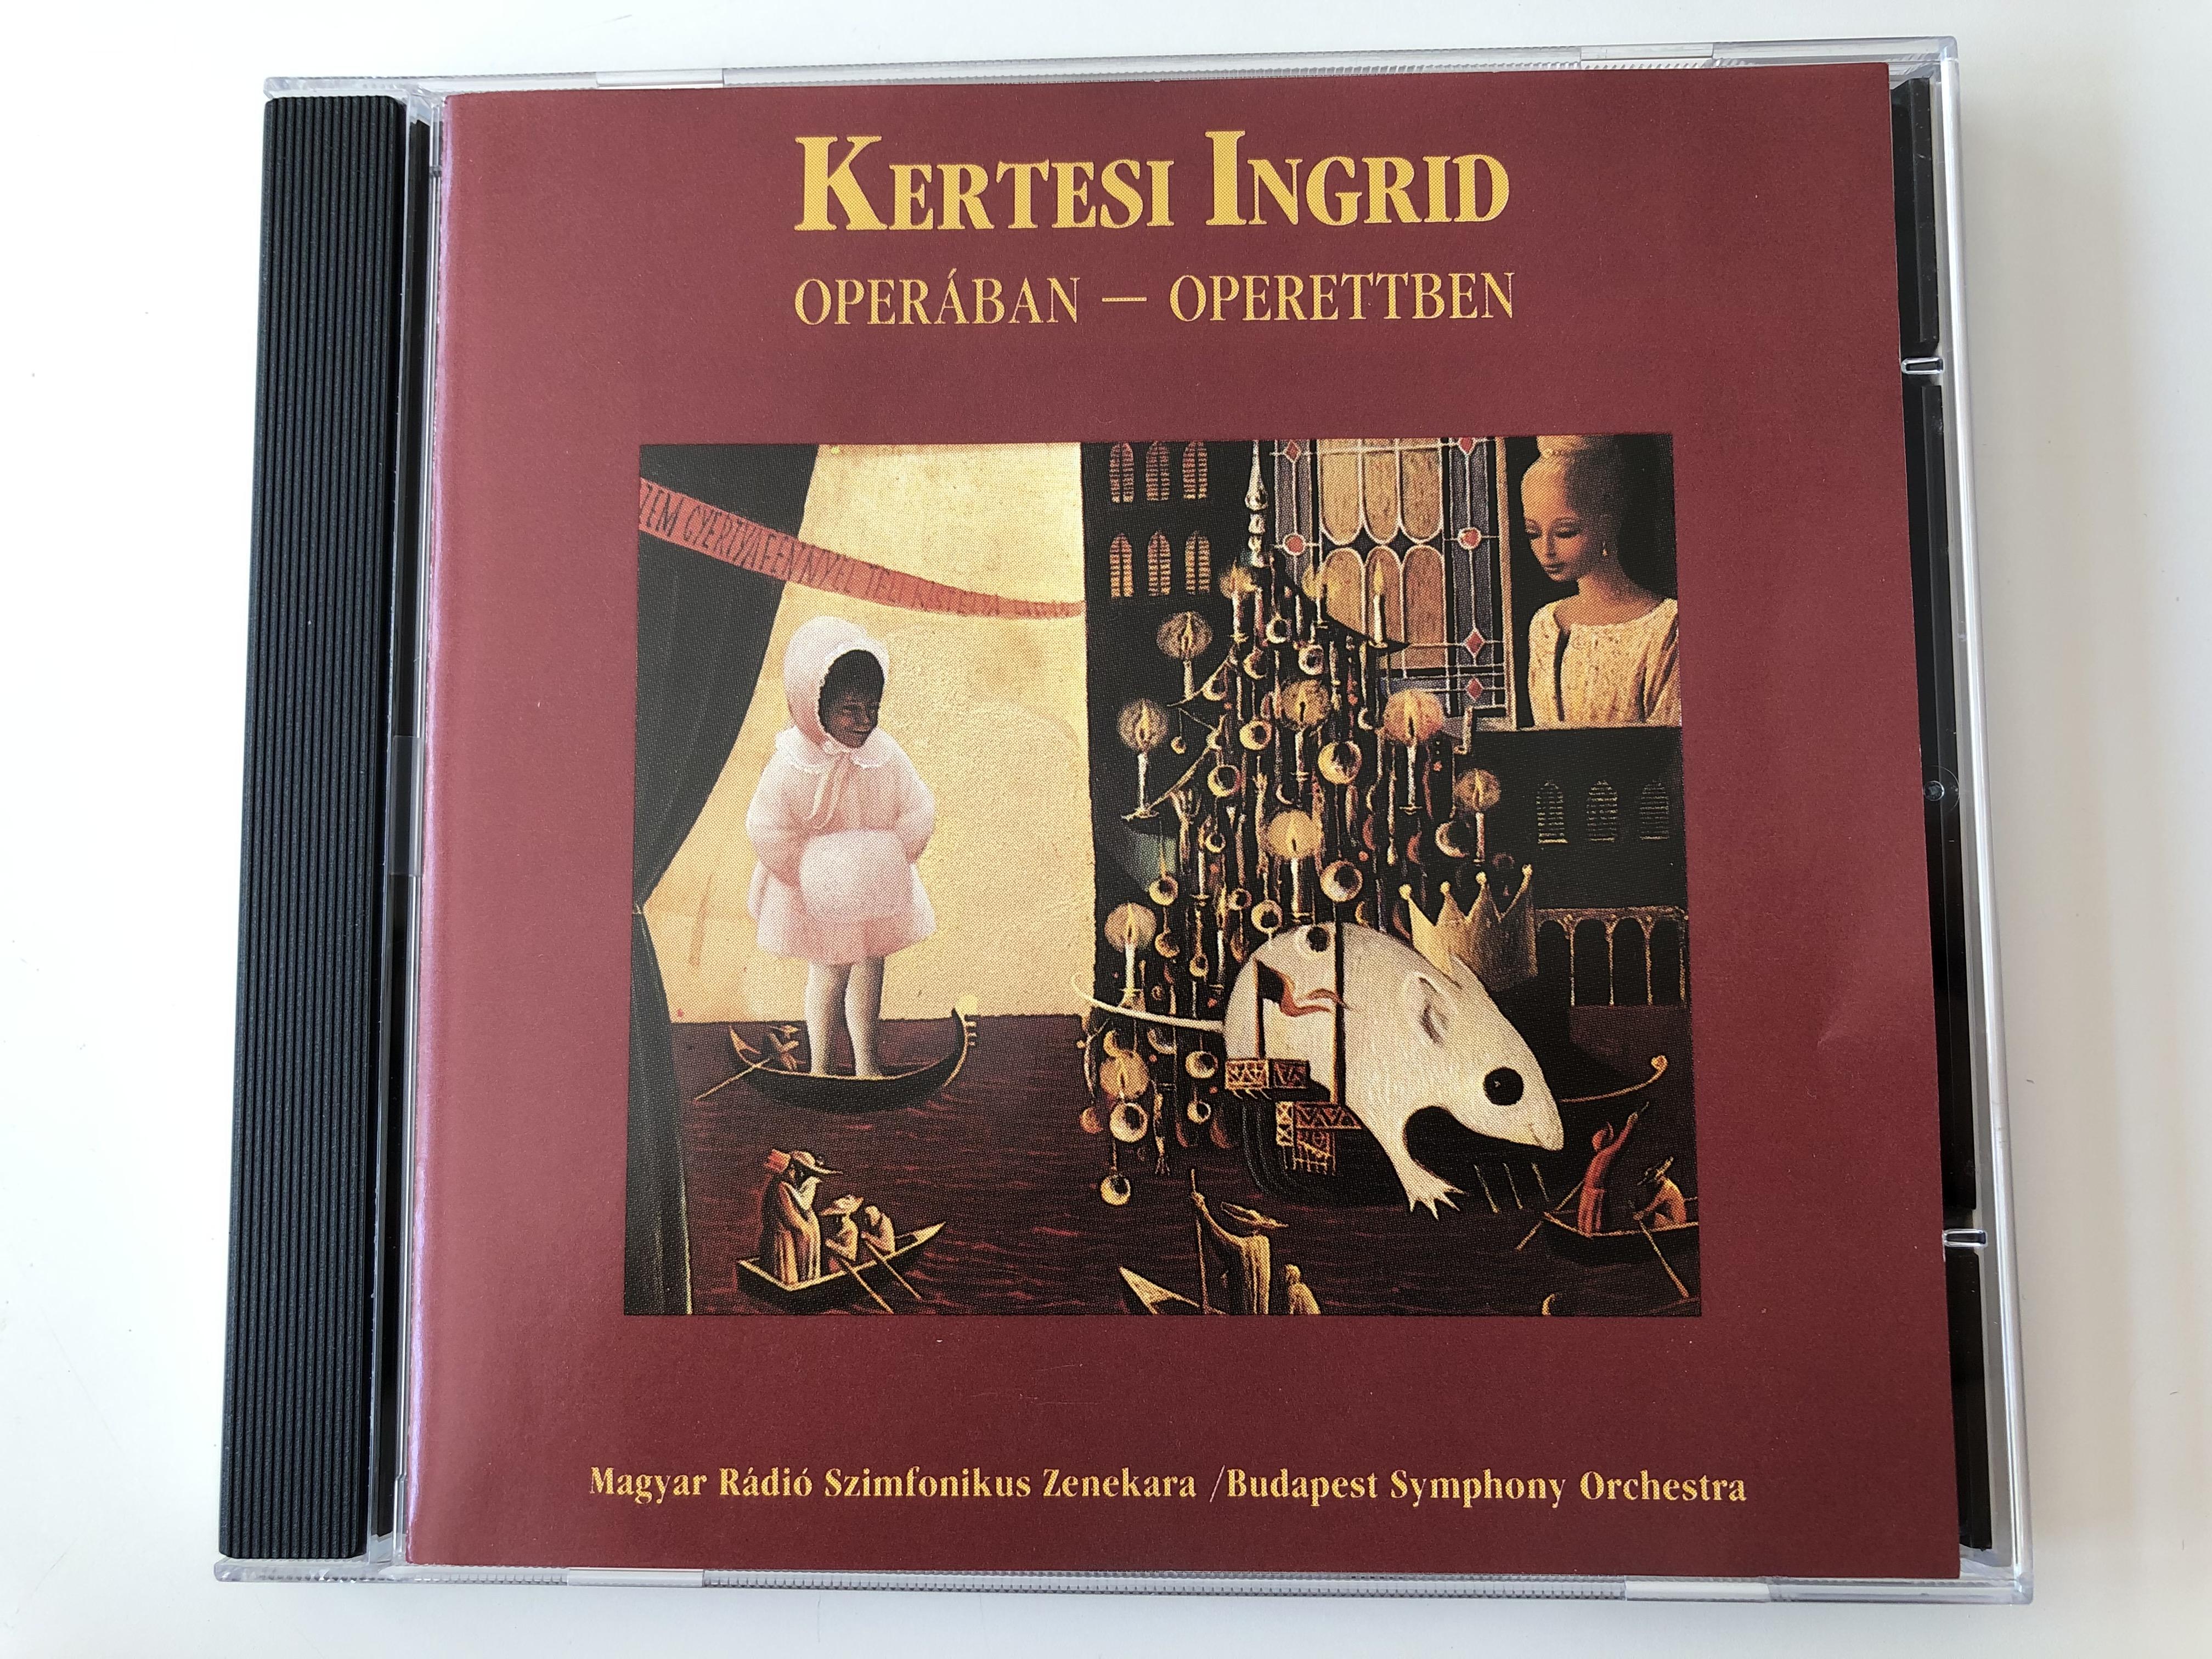 kertesi-ingrid-oper-ban-operettben-magyar-r-di-szimf-nikus-zenekara-budapest-symphony-orchestra-radioton-audio-cd-1991-stereo-hcd-31468-1-.jpg